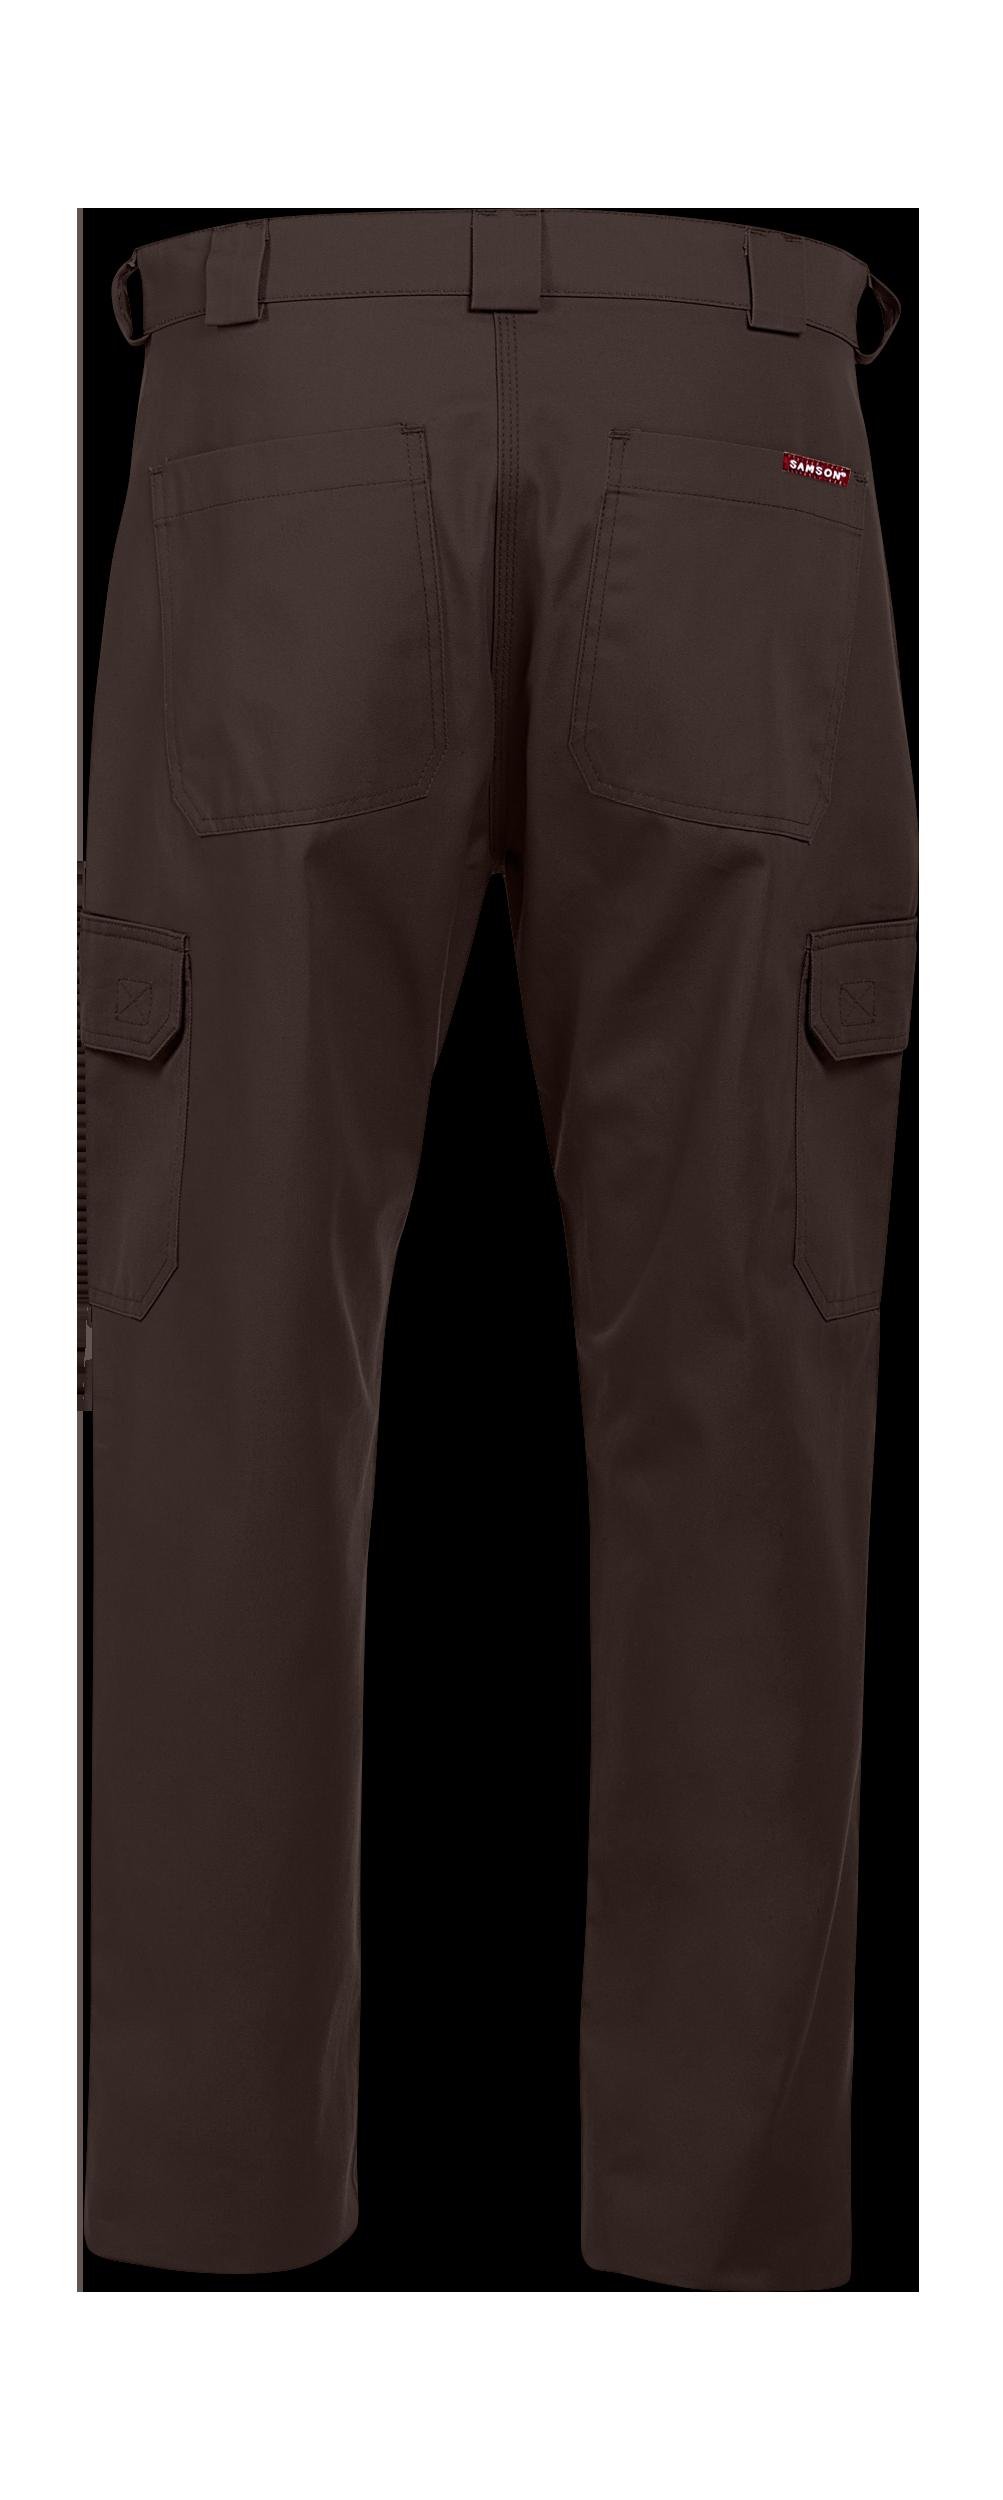 Samson - Workwear - Mens Workwear Cargo Trouser